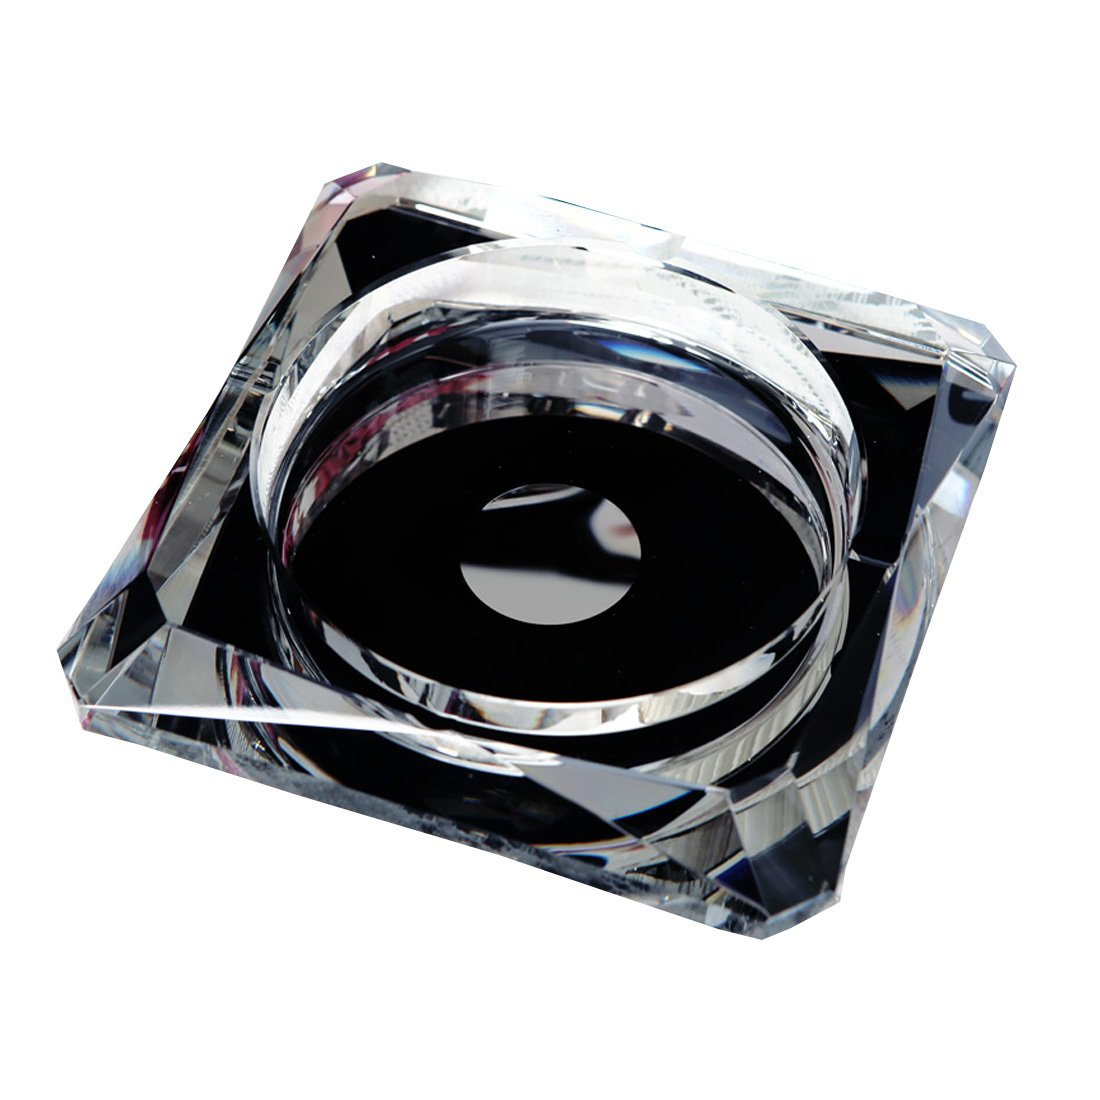 OSONA 高級 卓上灰皿 クリスタル ガラス 灰皿 アッシュトレイ おしゃれ灰皿 ブラック 15cm B01HPXUCH0 15cm|ブラック ブラック 15cm